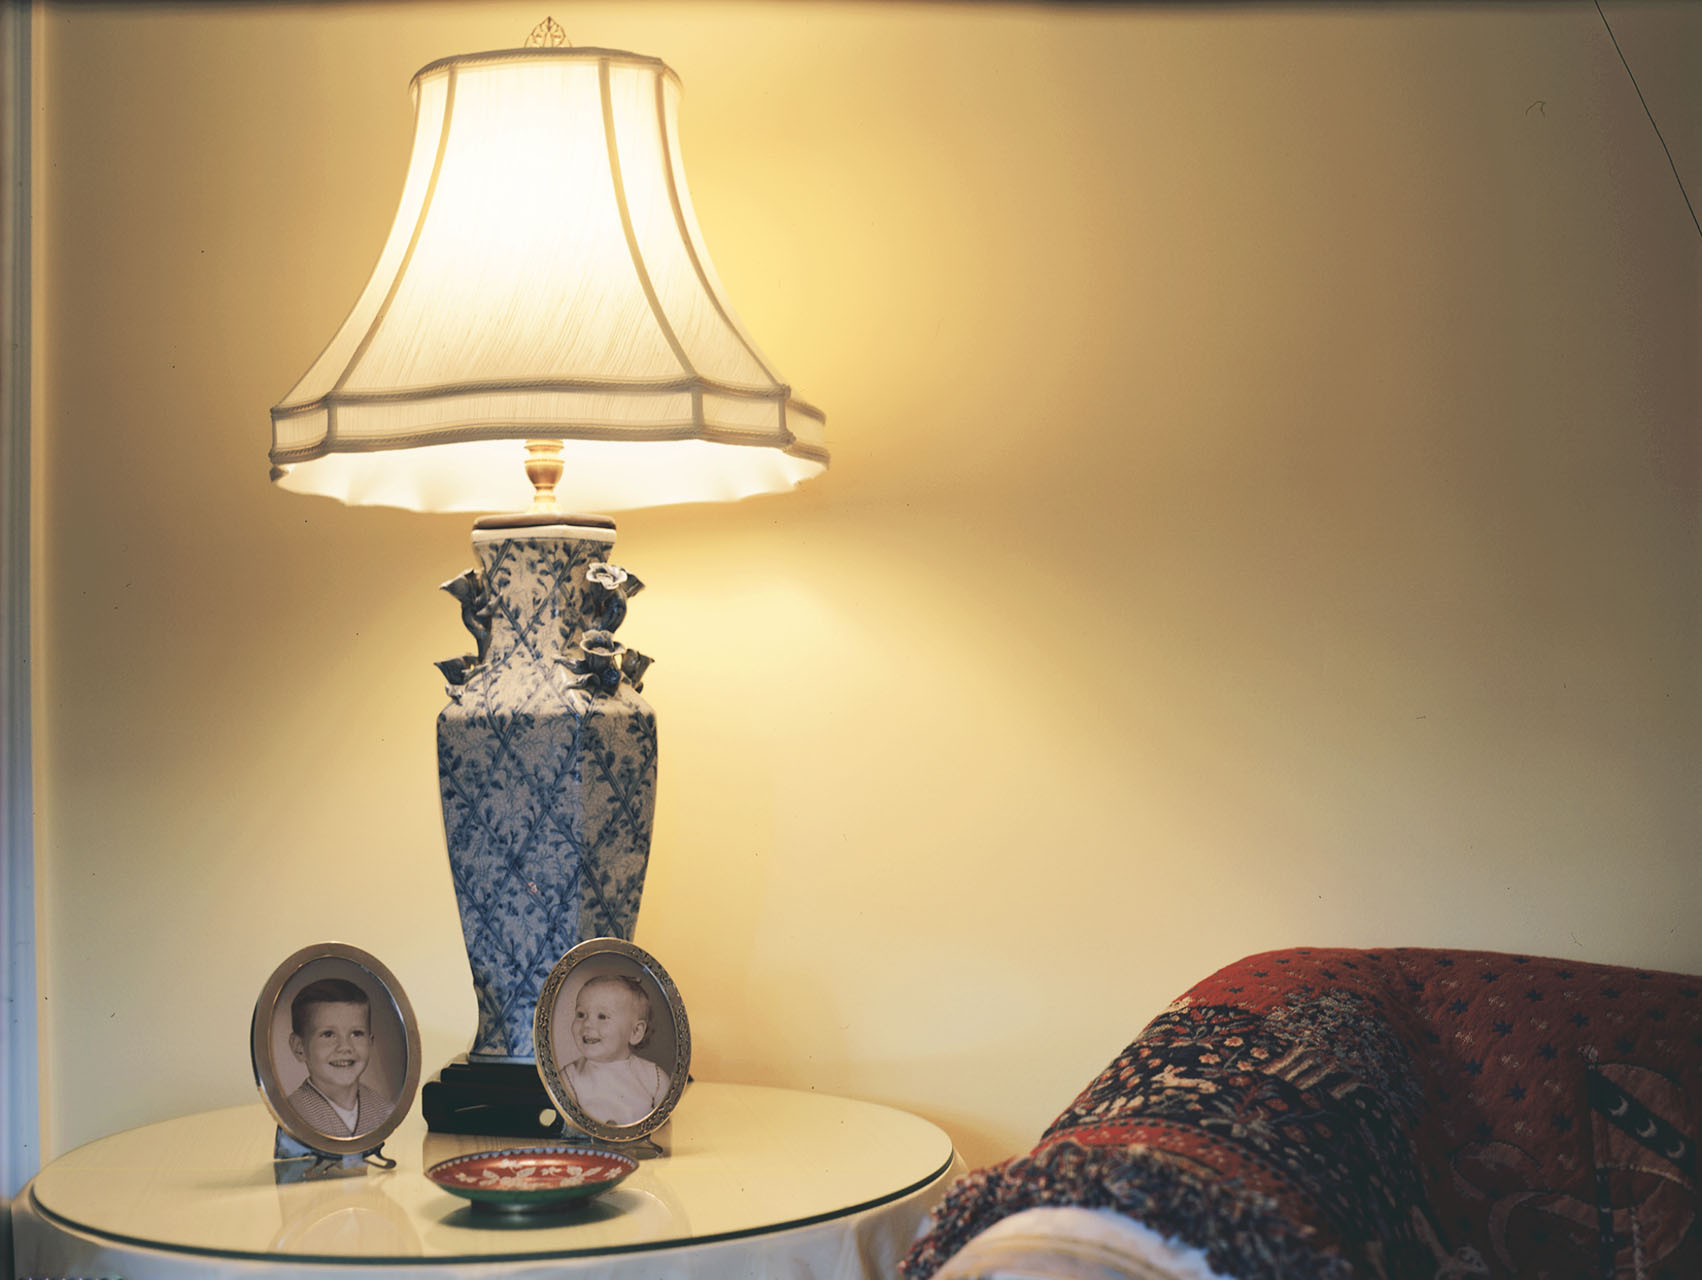 uplandwaylamp.jpg